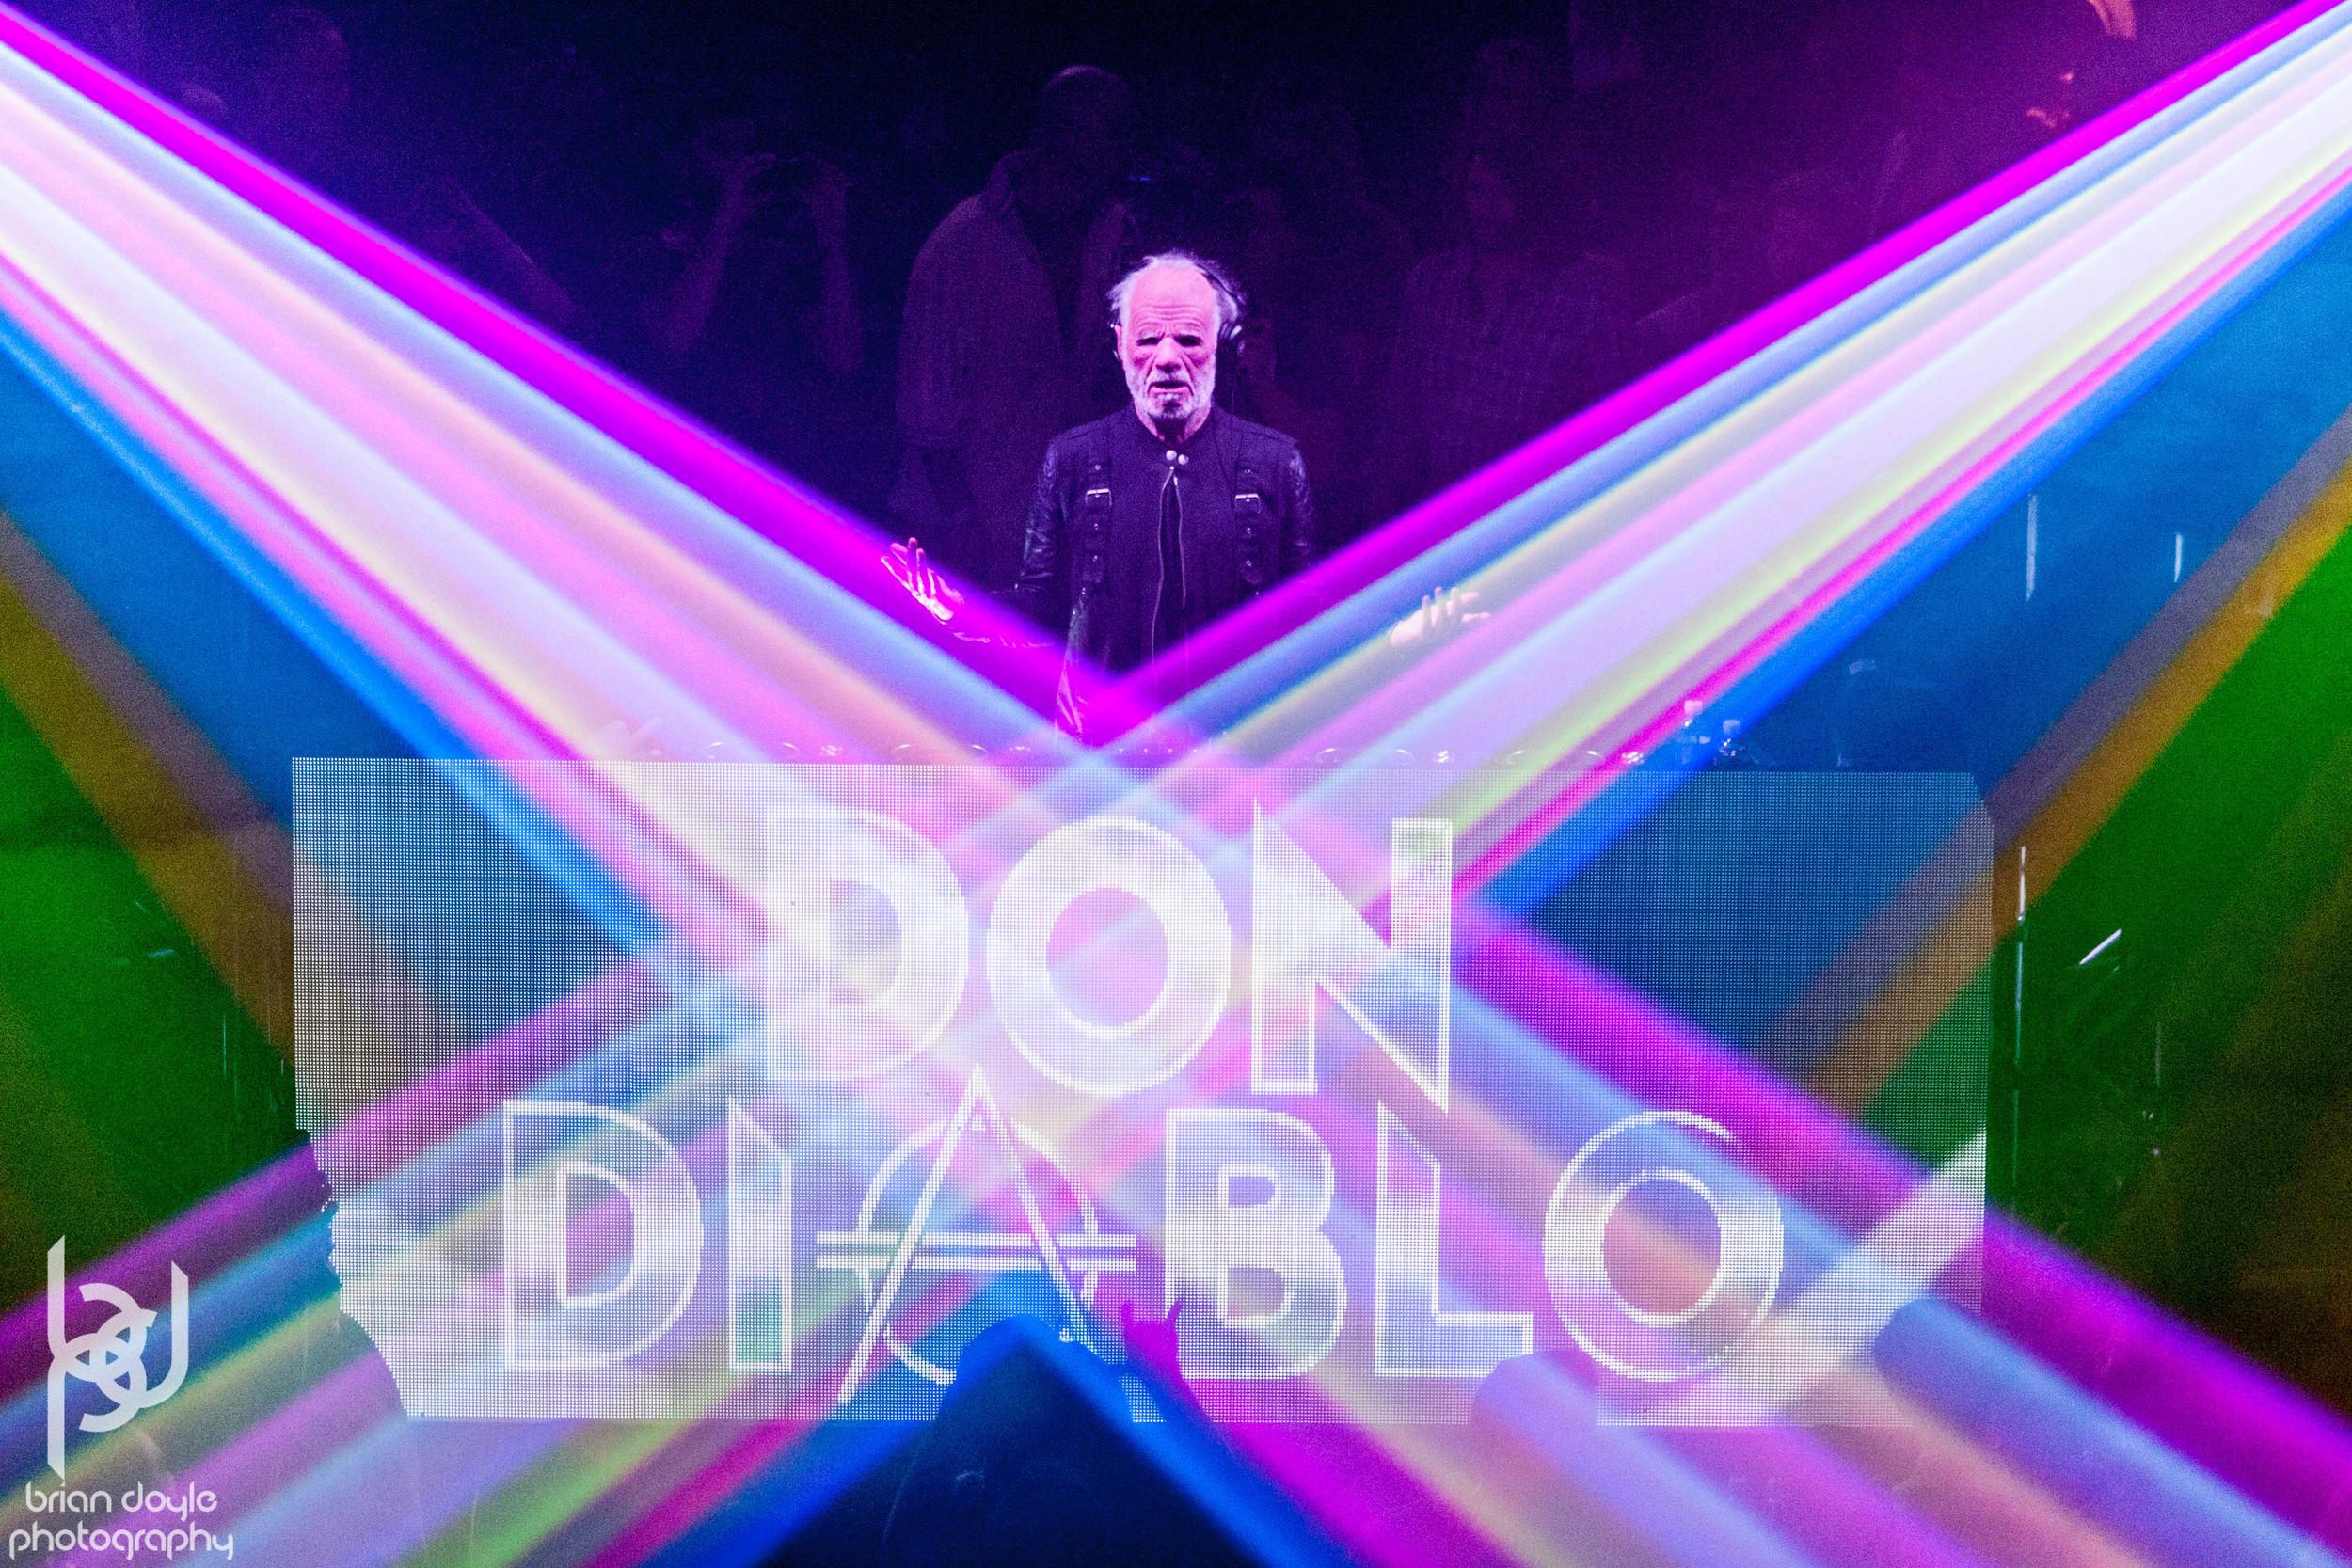 Don Diablo at Avalon bdp 20140908-36.jpg